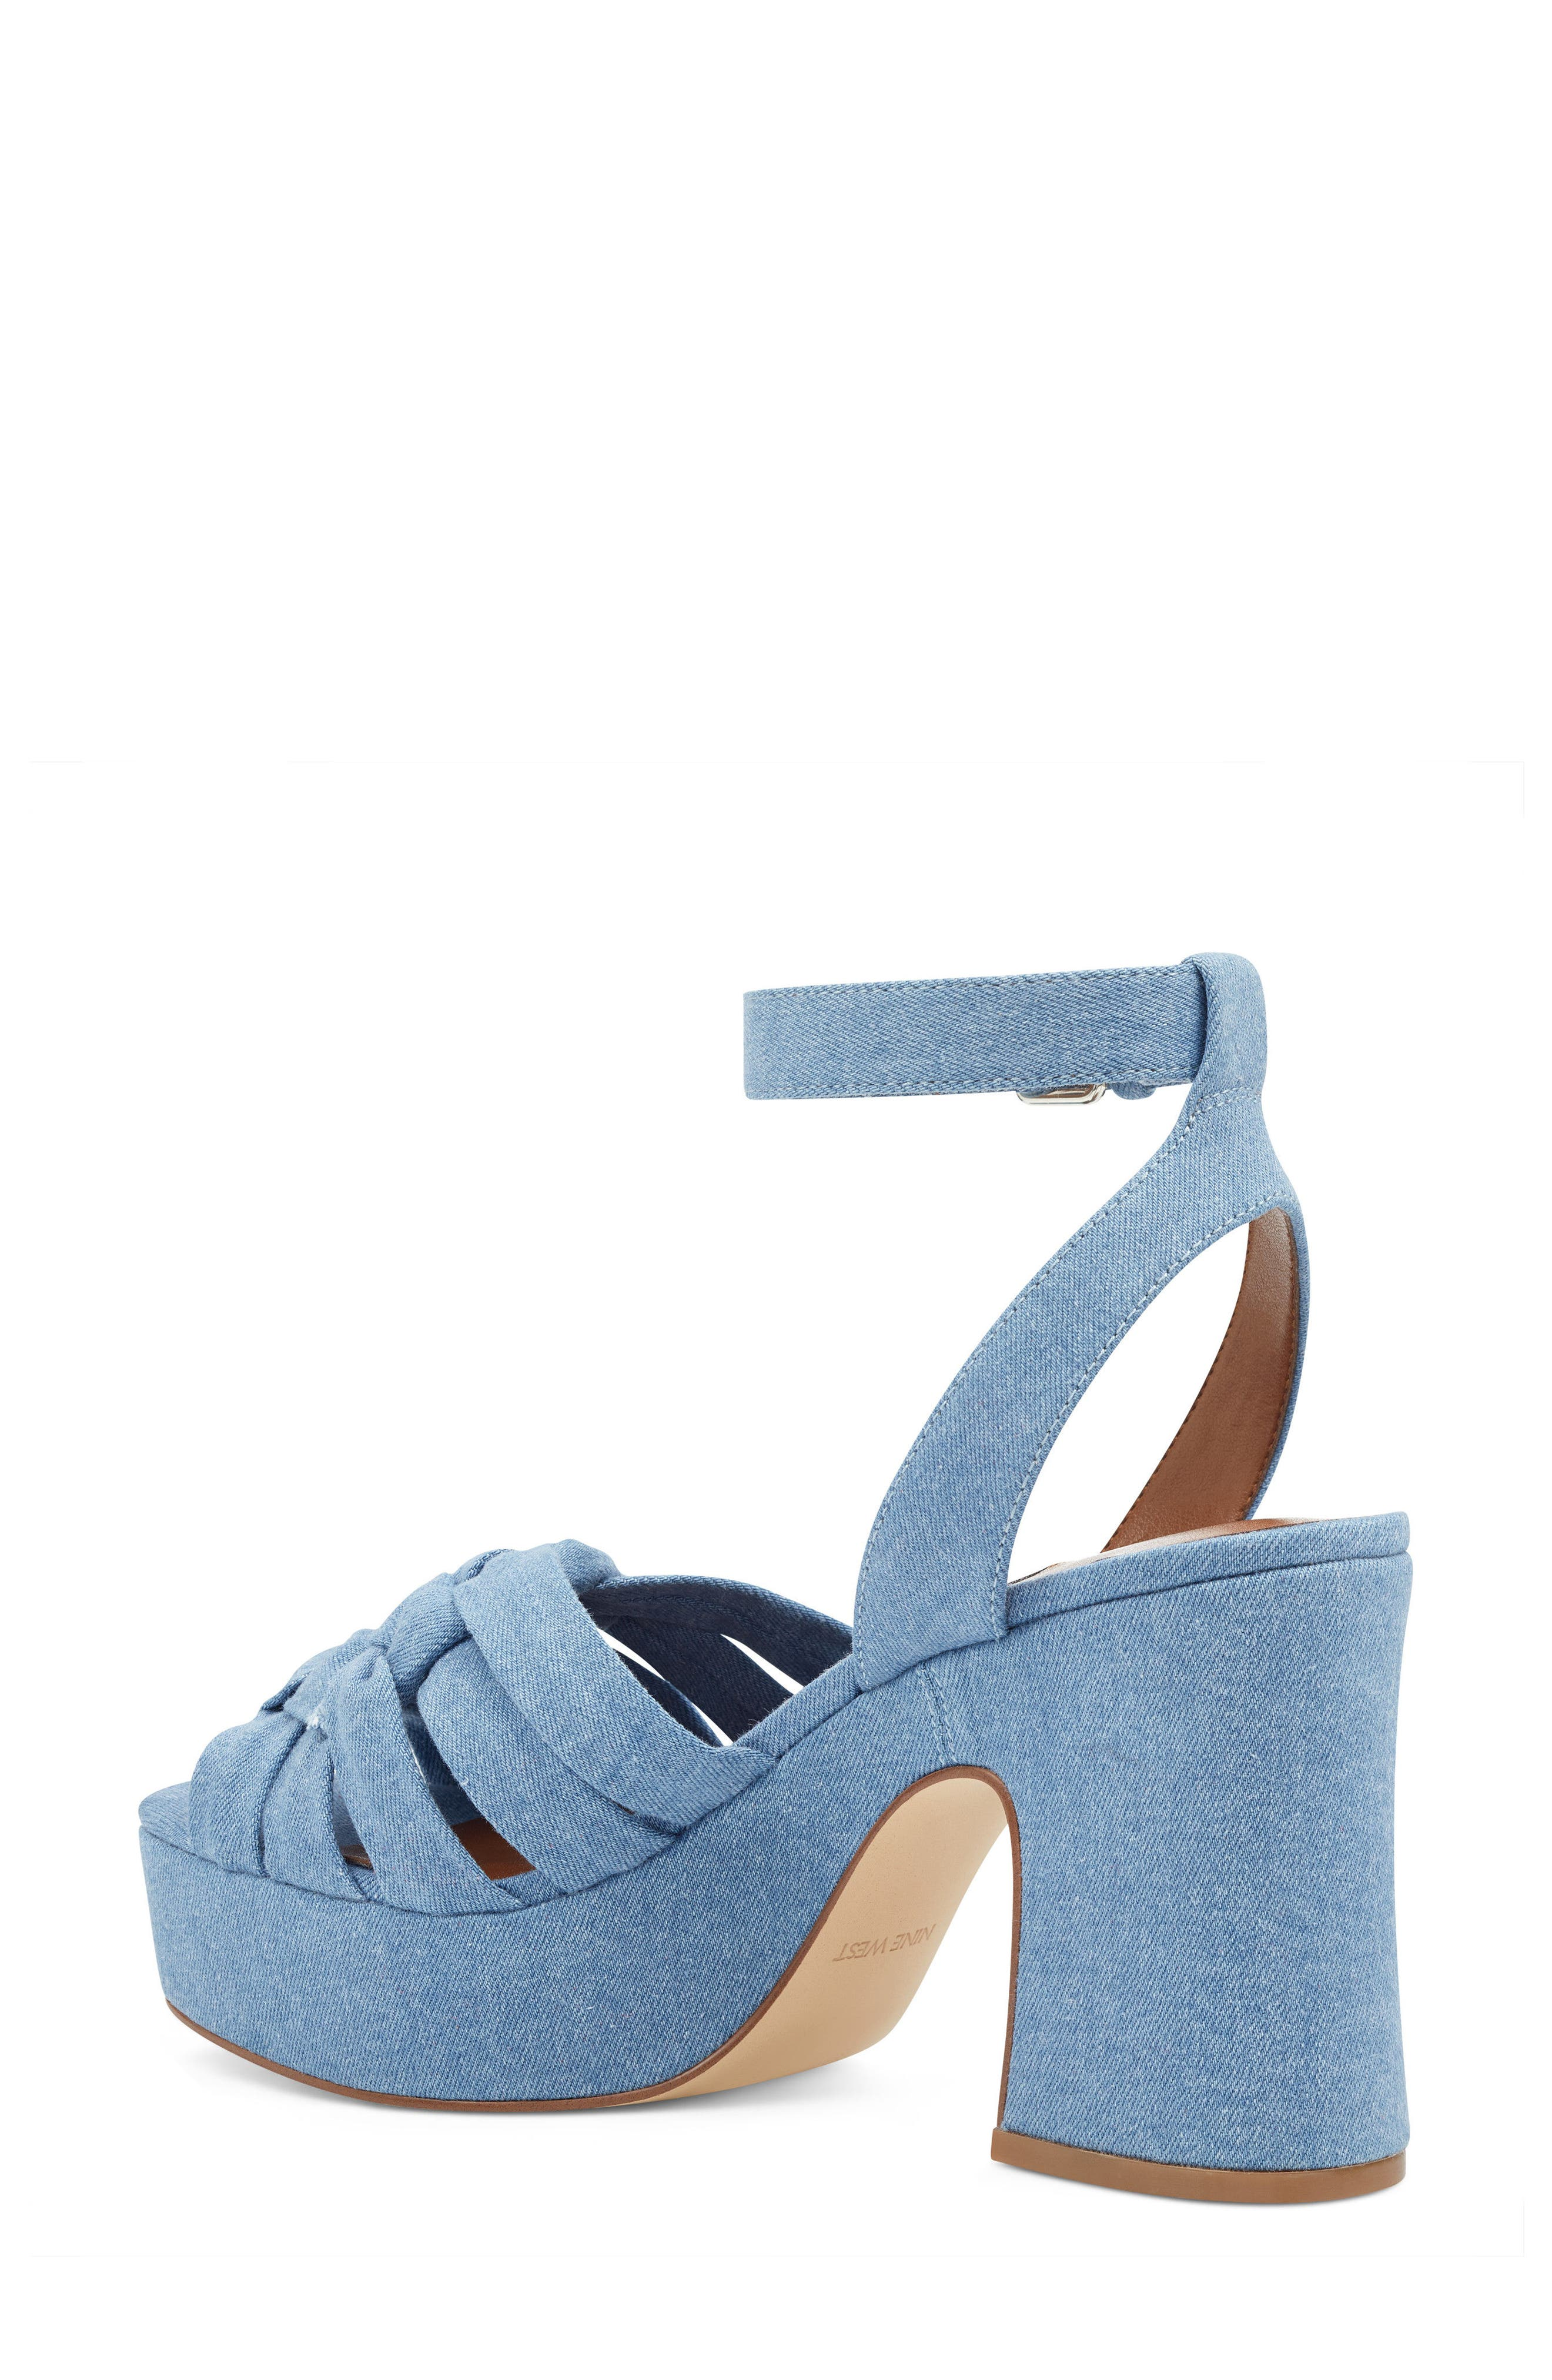 Fetuchini Platform Sandal,                             Alternate thumbnail 2, color,                             LIGHT BLUE DENIM